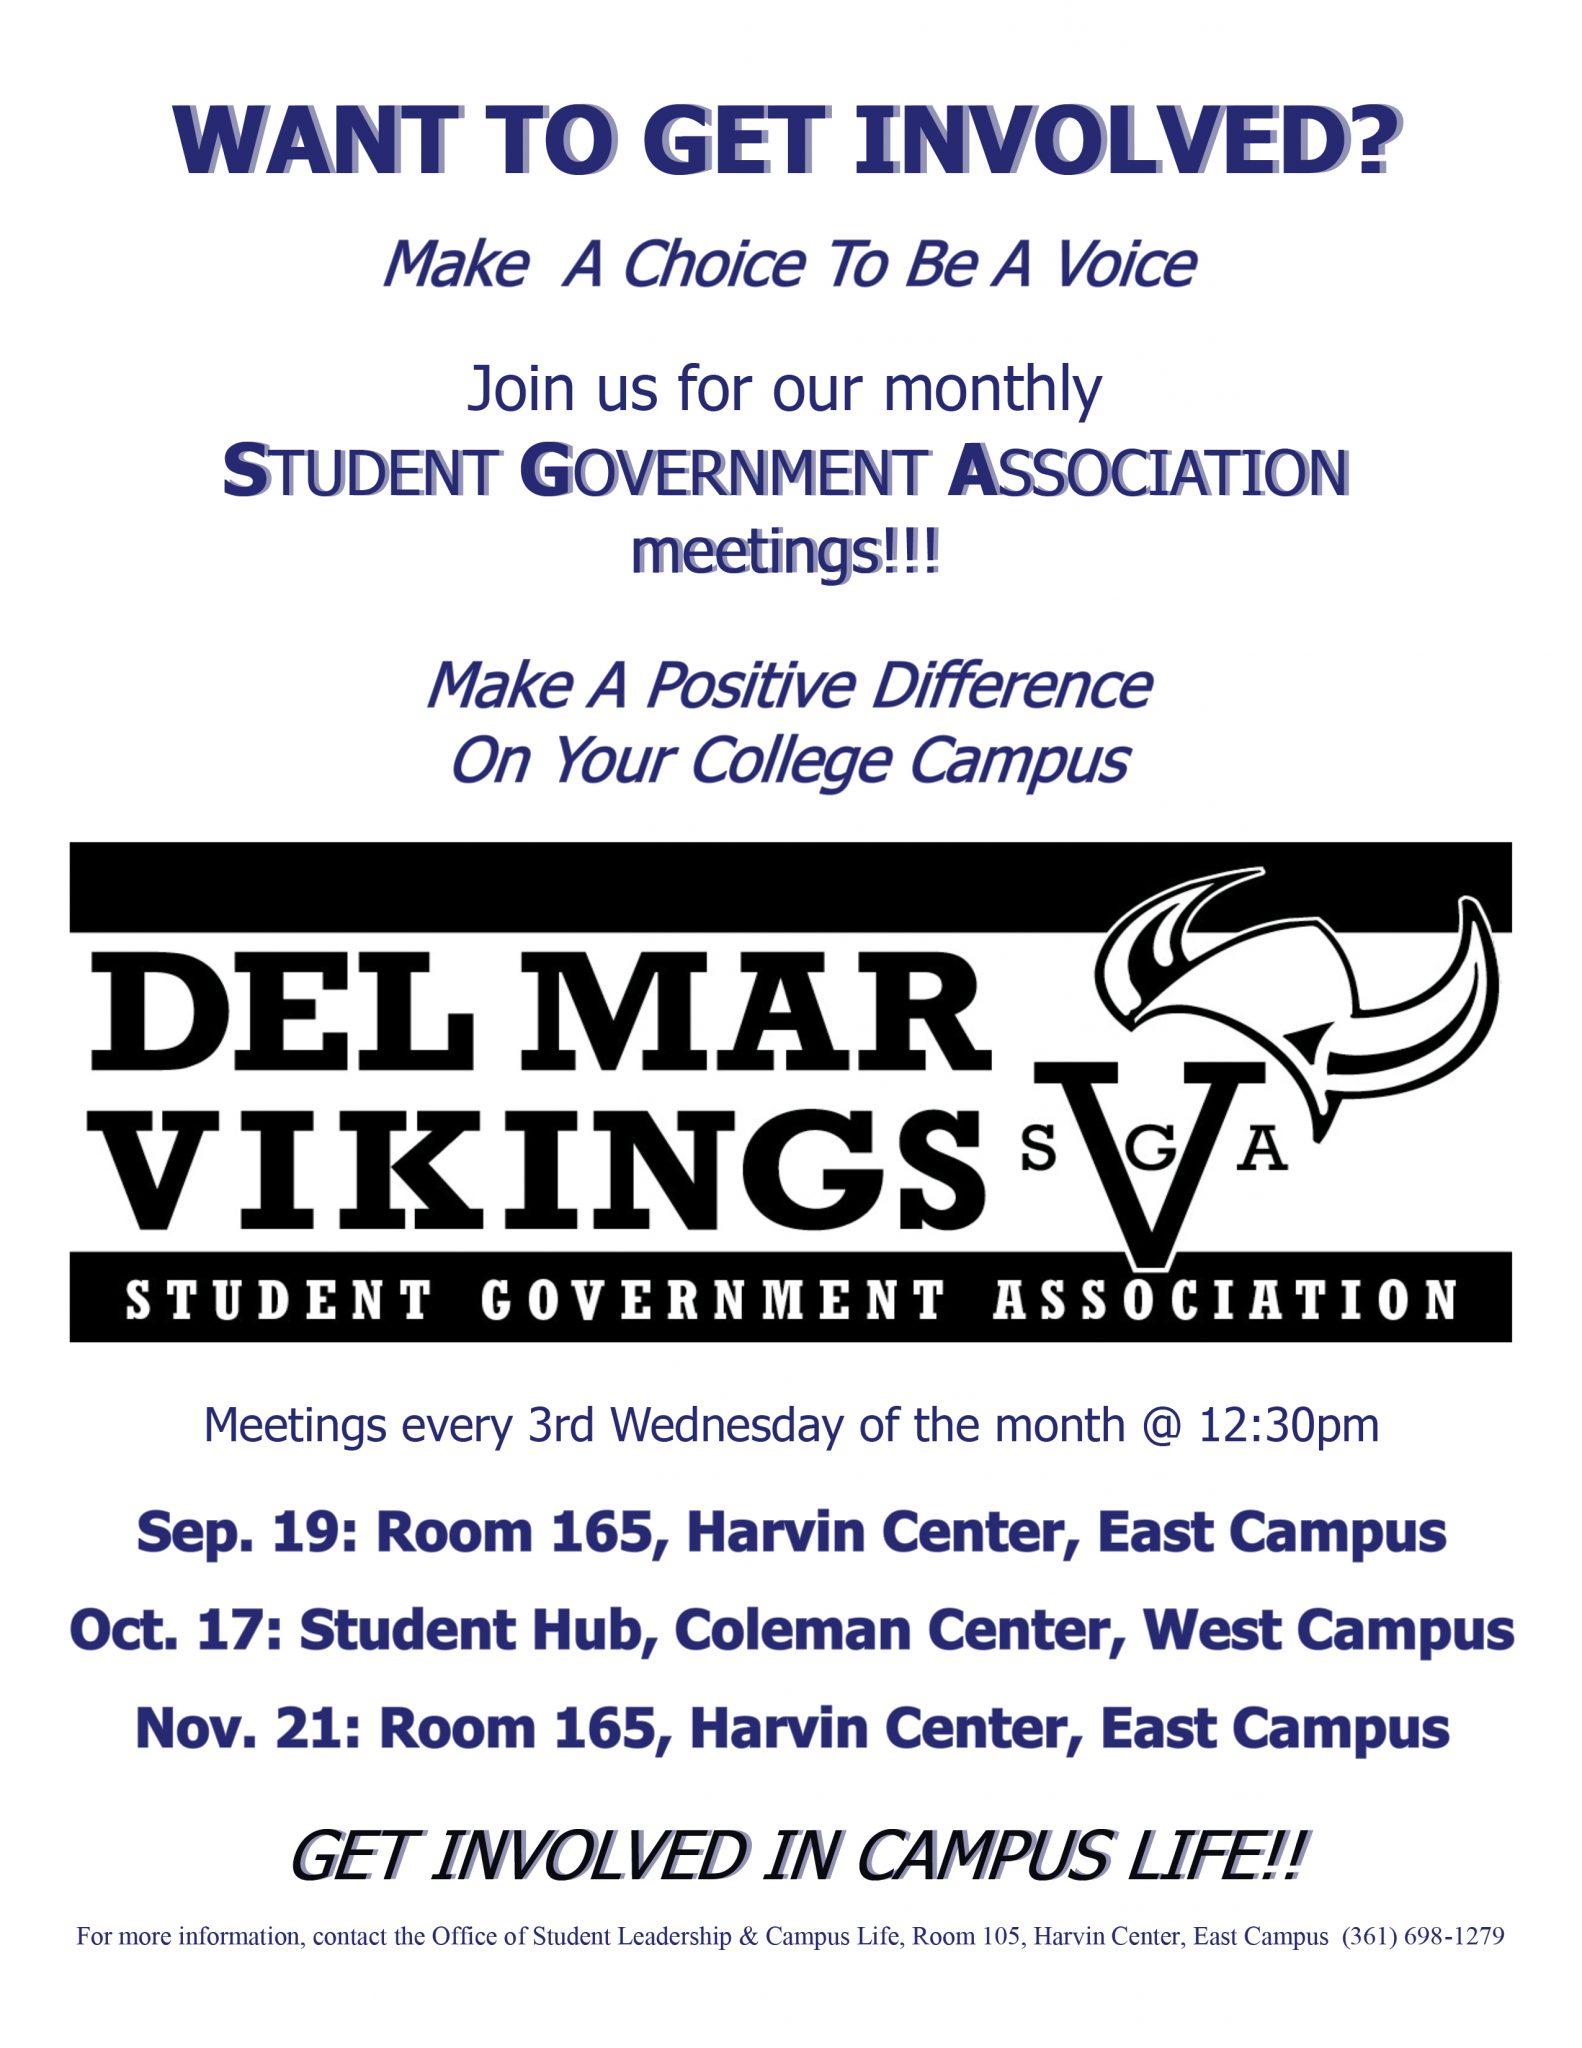 DMC Student Government Association